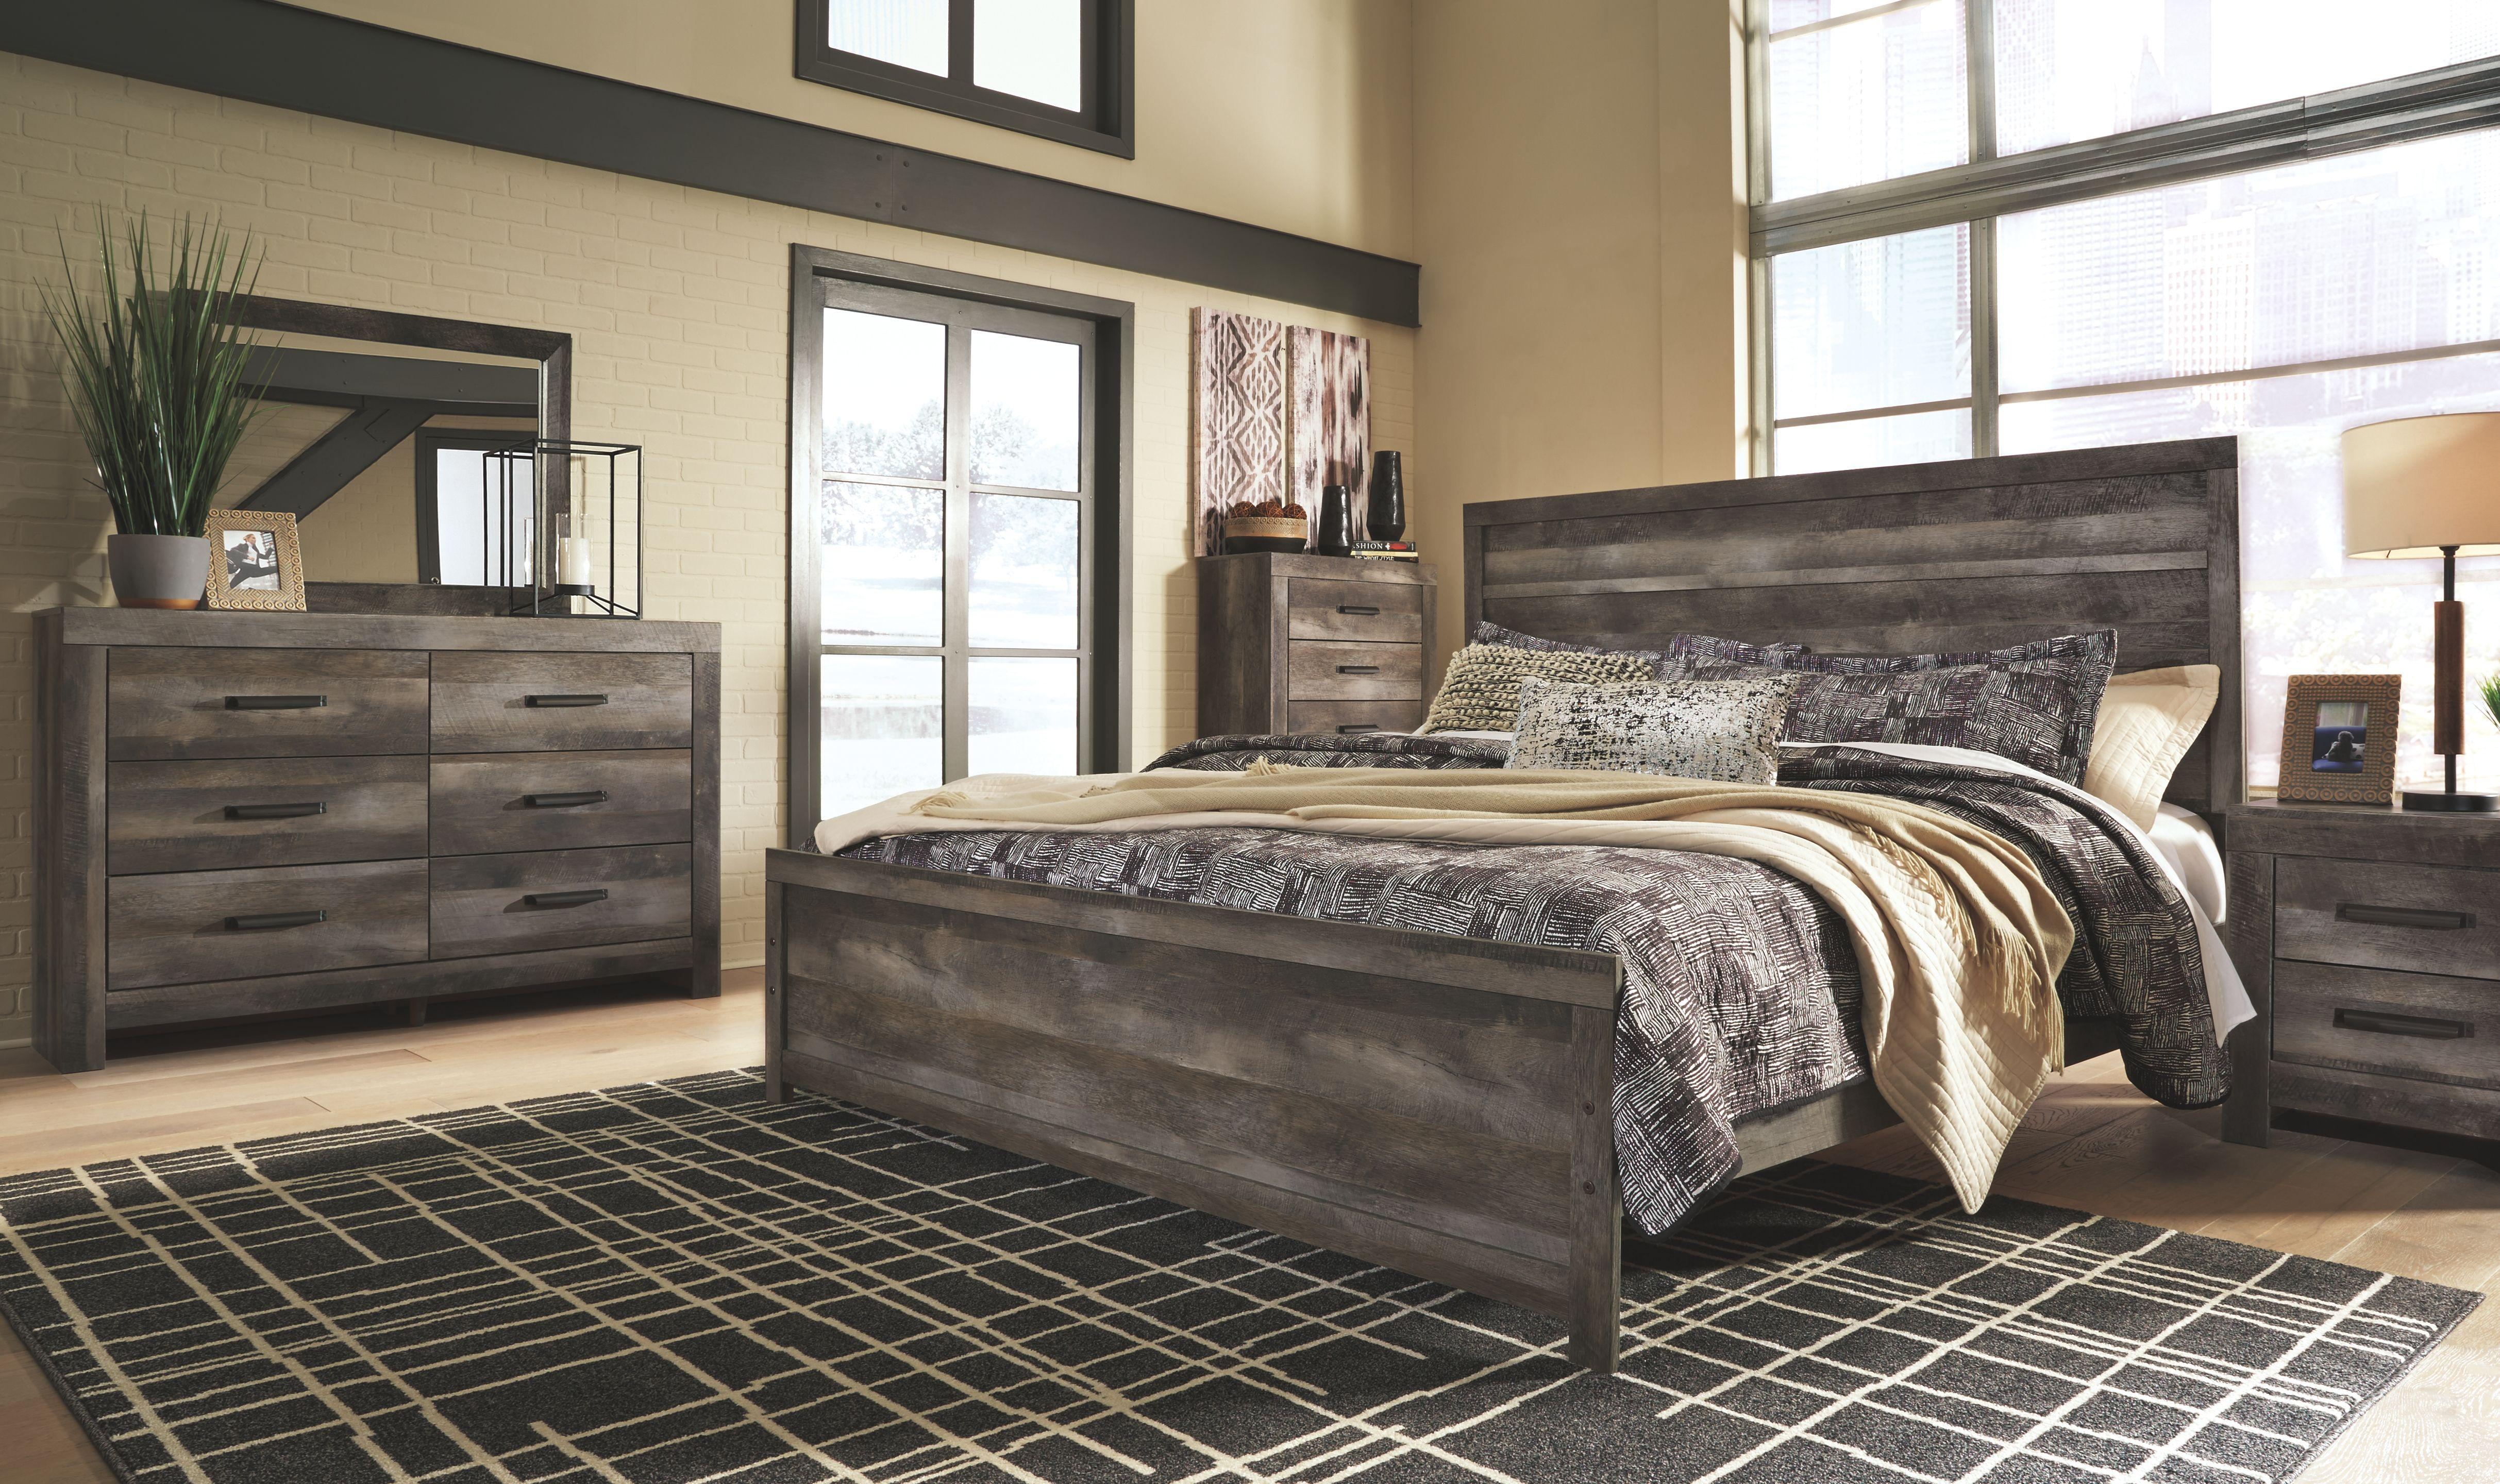 Wynnlow King Panel Bed, Gray Bedroom sets, Bedroom set